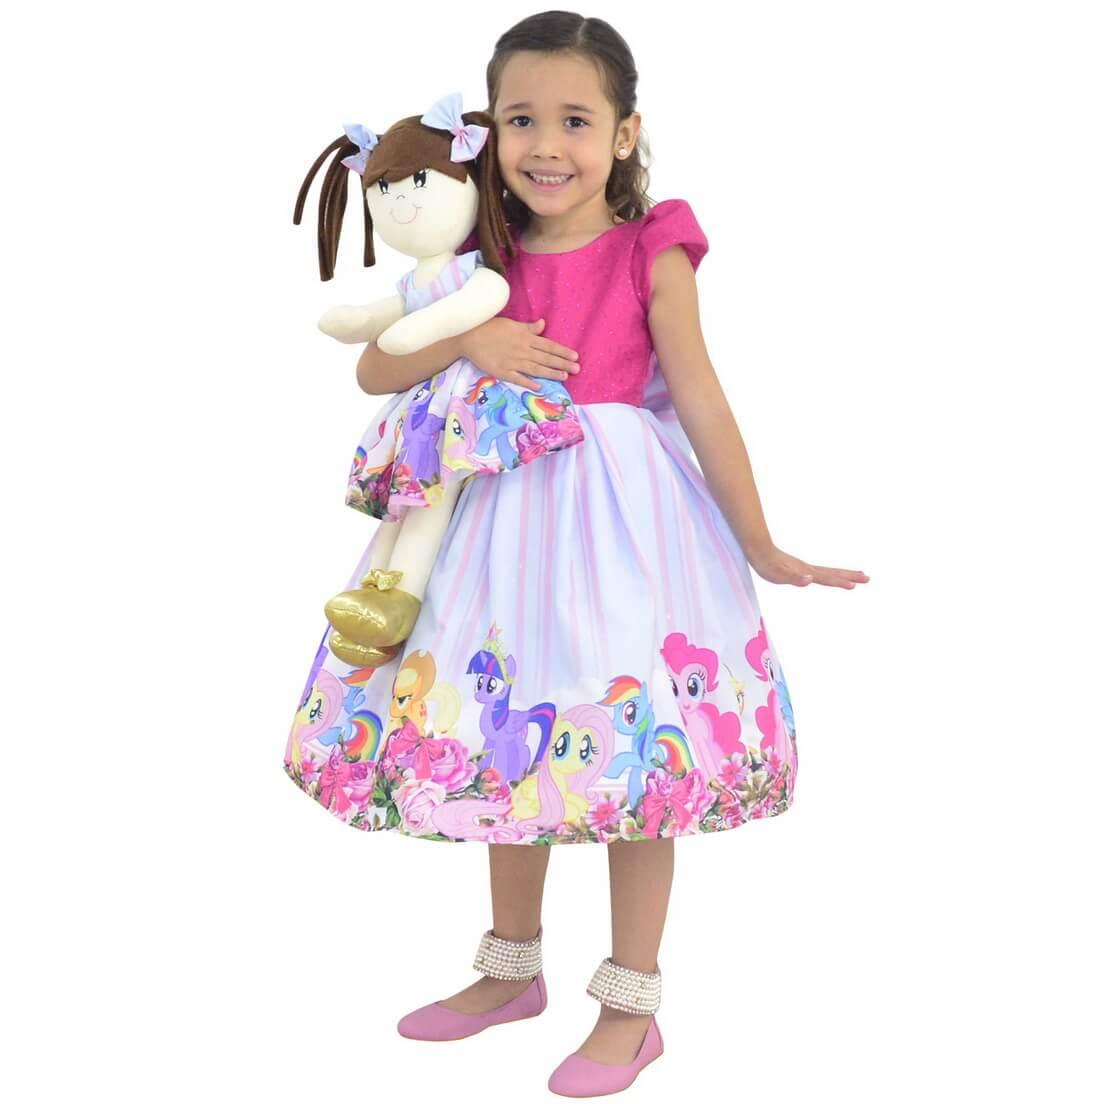 Tal Menina Tal Boneca Mari - Vestido My Little Pony Luxo